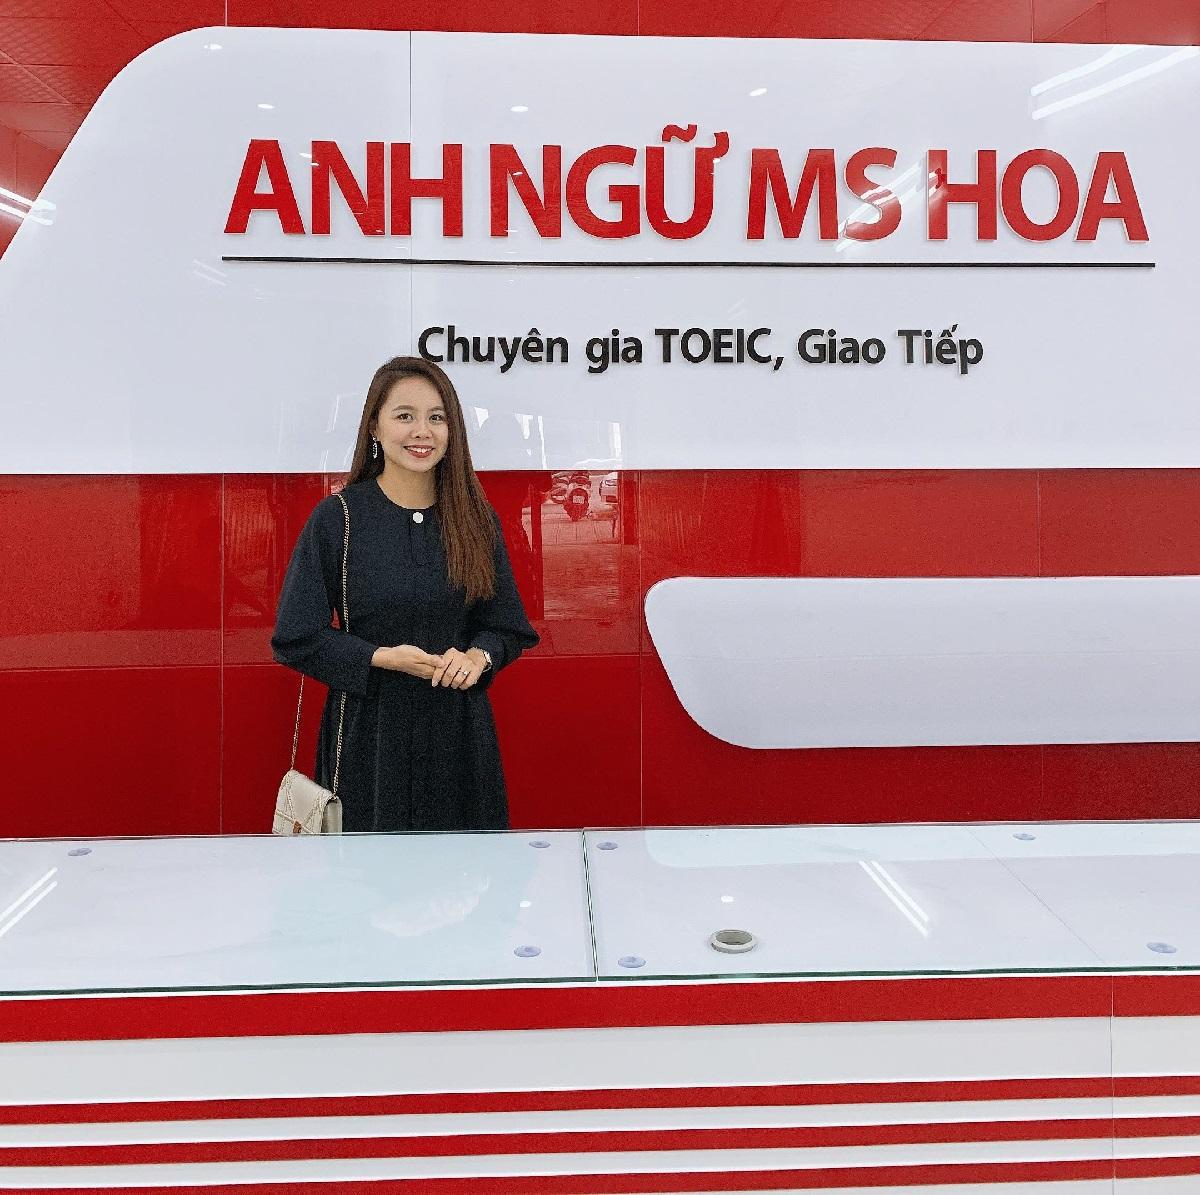 Ms Hoa - Founder của Anh Ngữ Ms Hoa